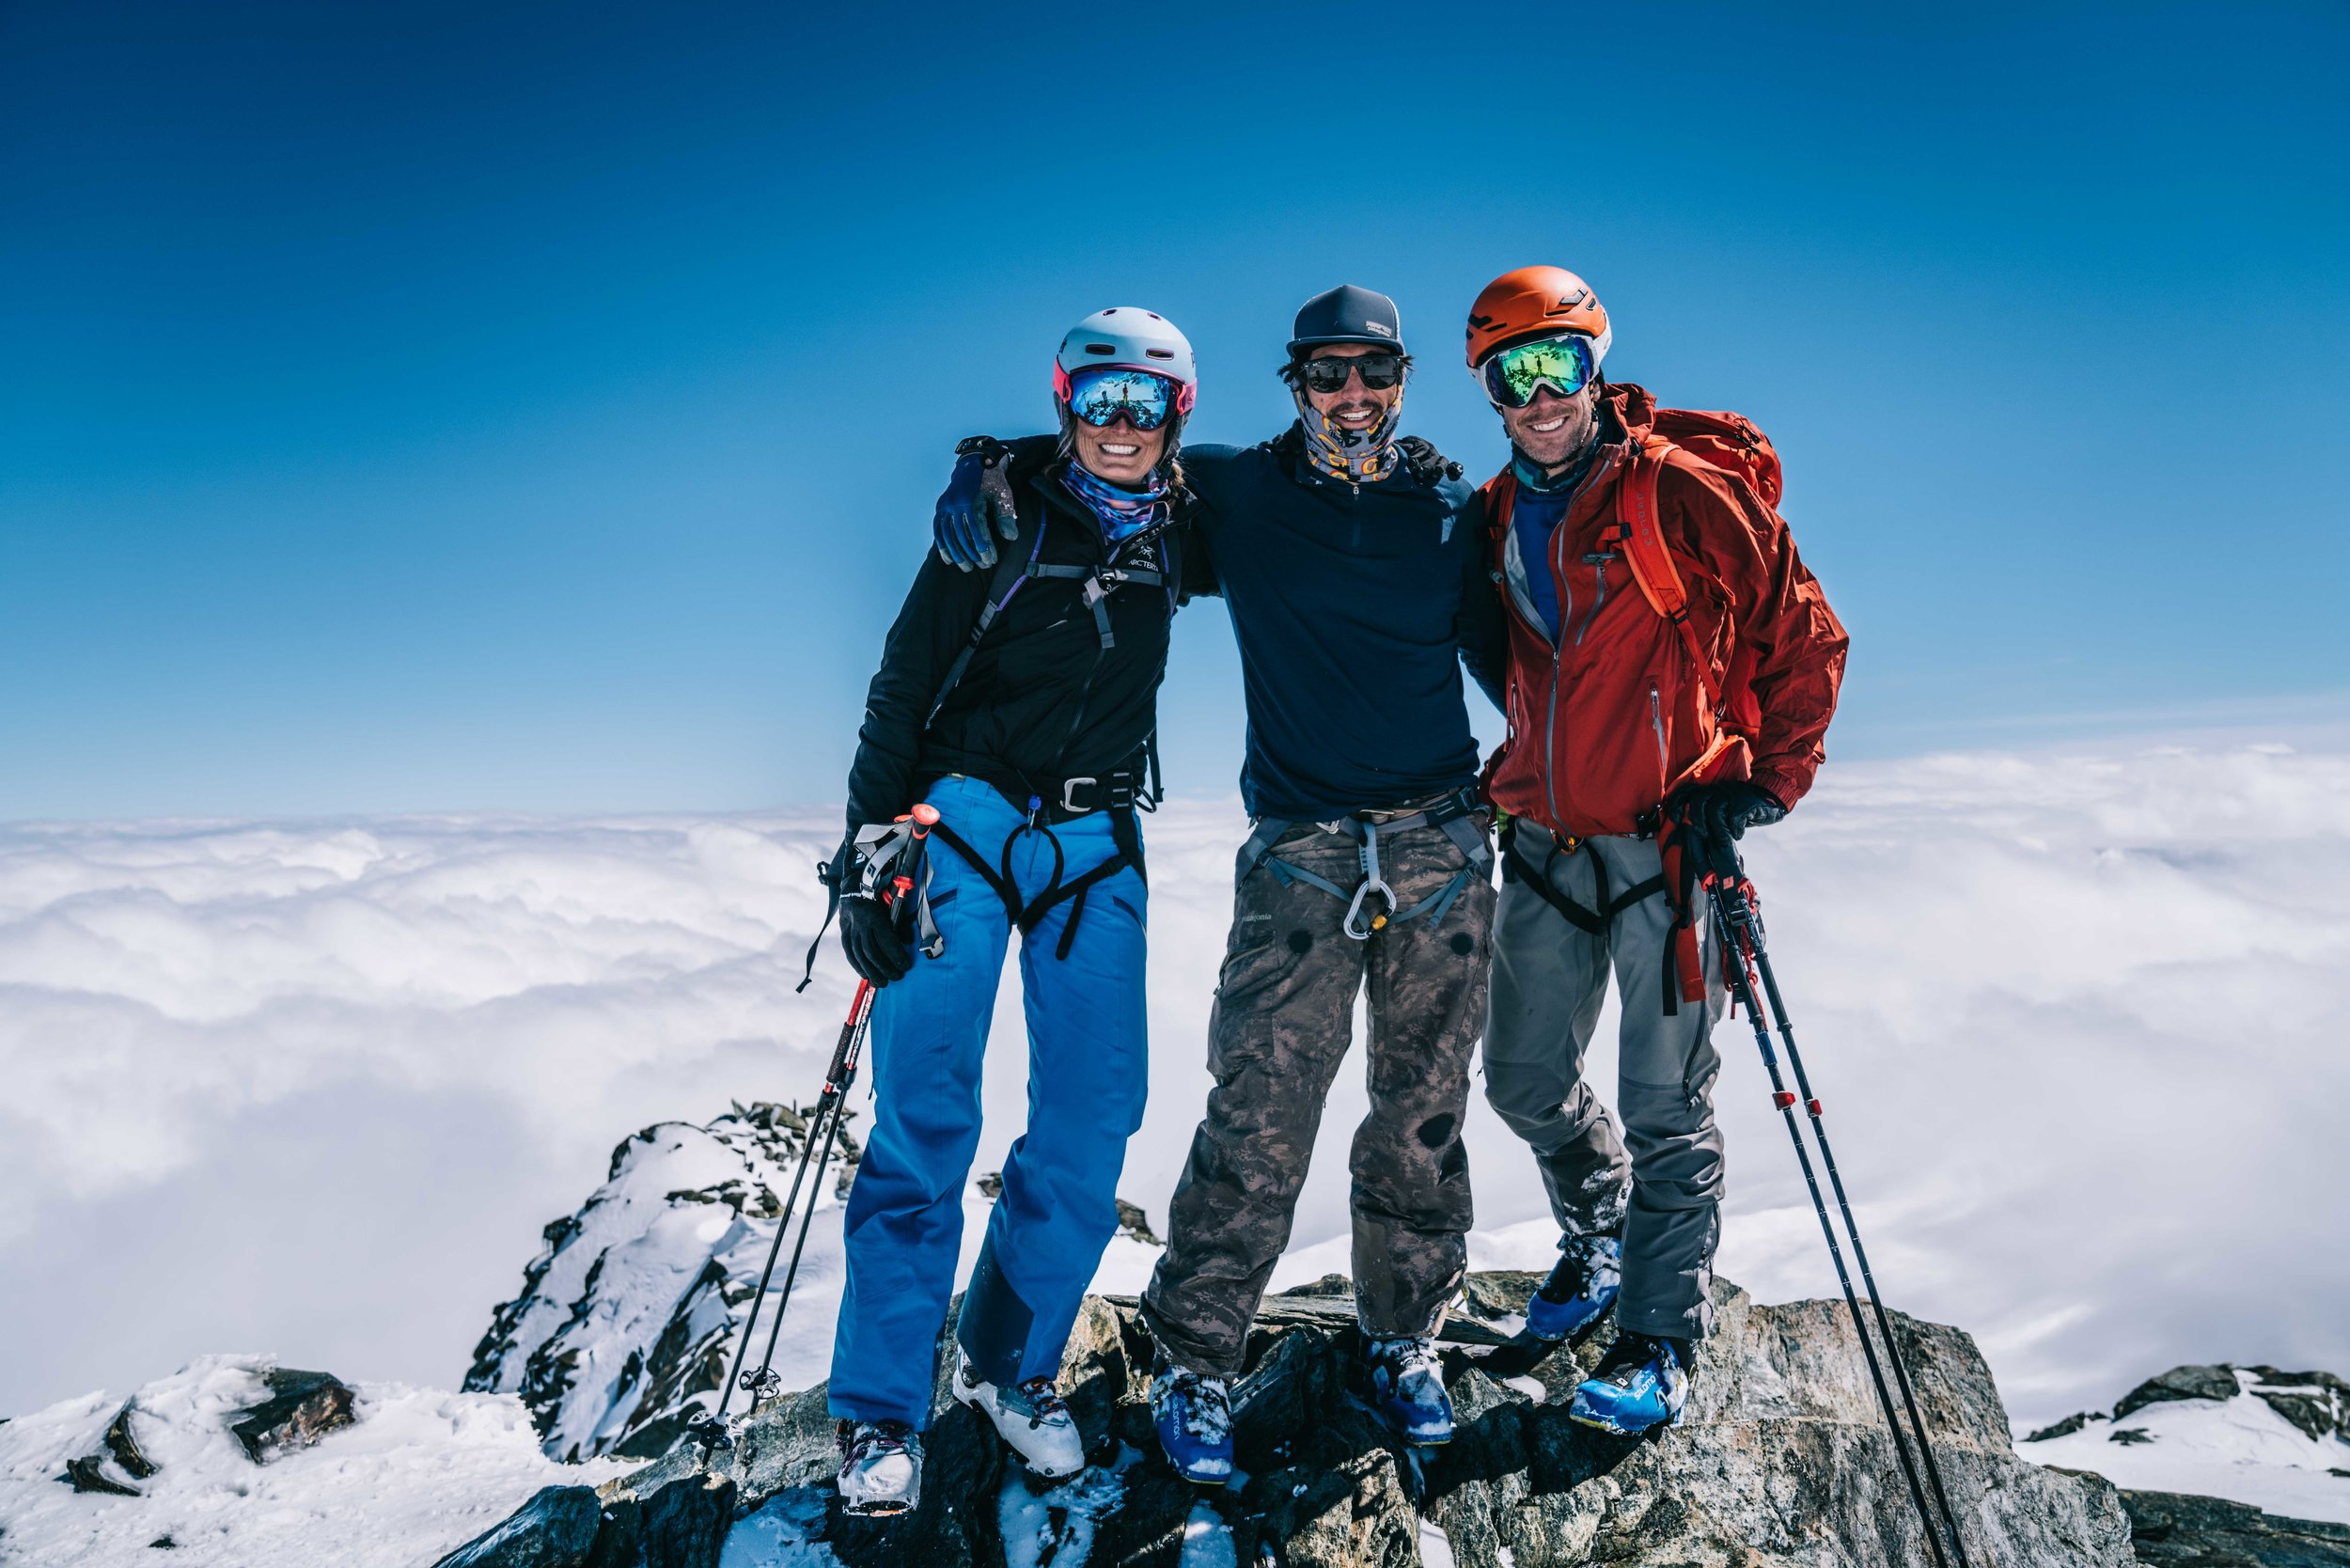 Formmates from 1997 (l. to r.) Kendall Krause, Grayson Schaffer, and Puck Wheaton in Zermatt, Switzerland.